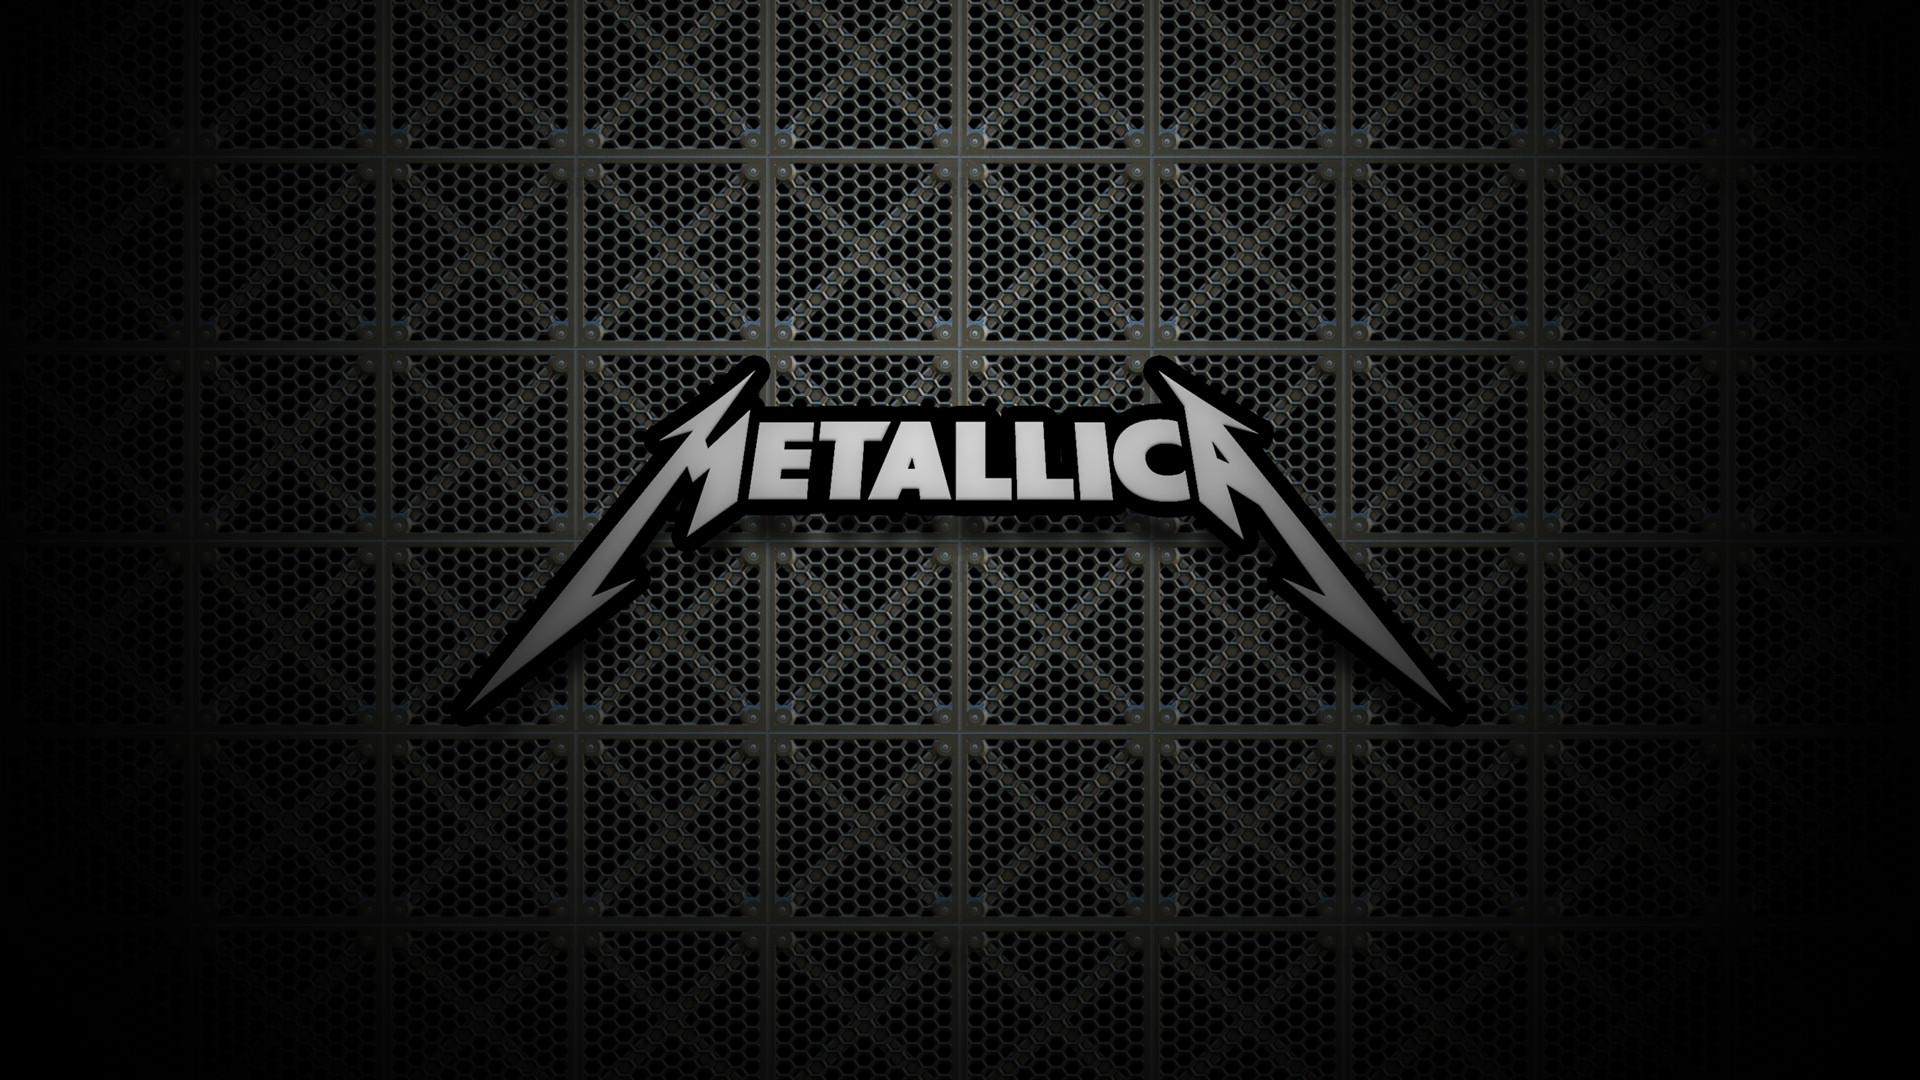 Metallica Wallpaper Ride The Lightning Metallica 1920×1080